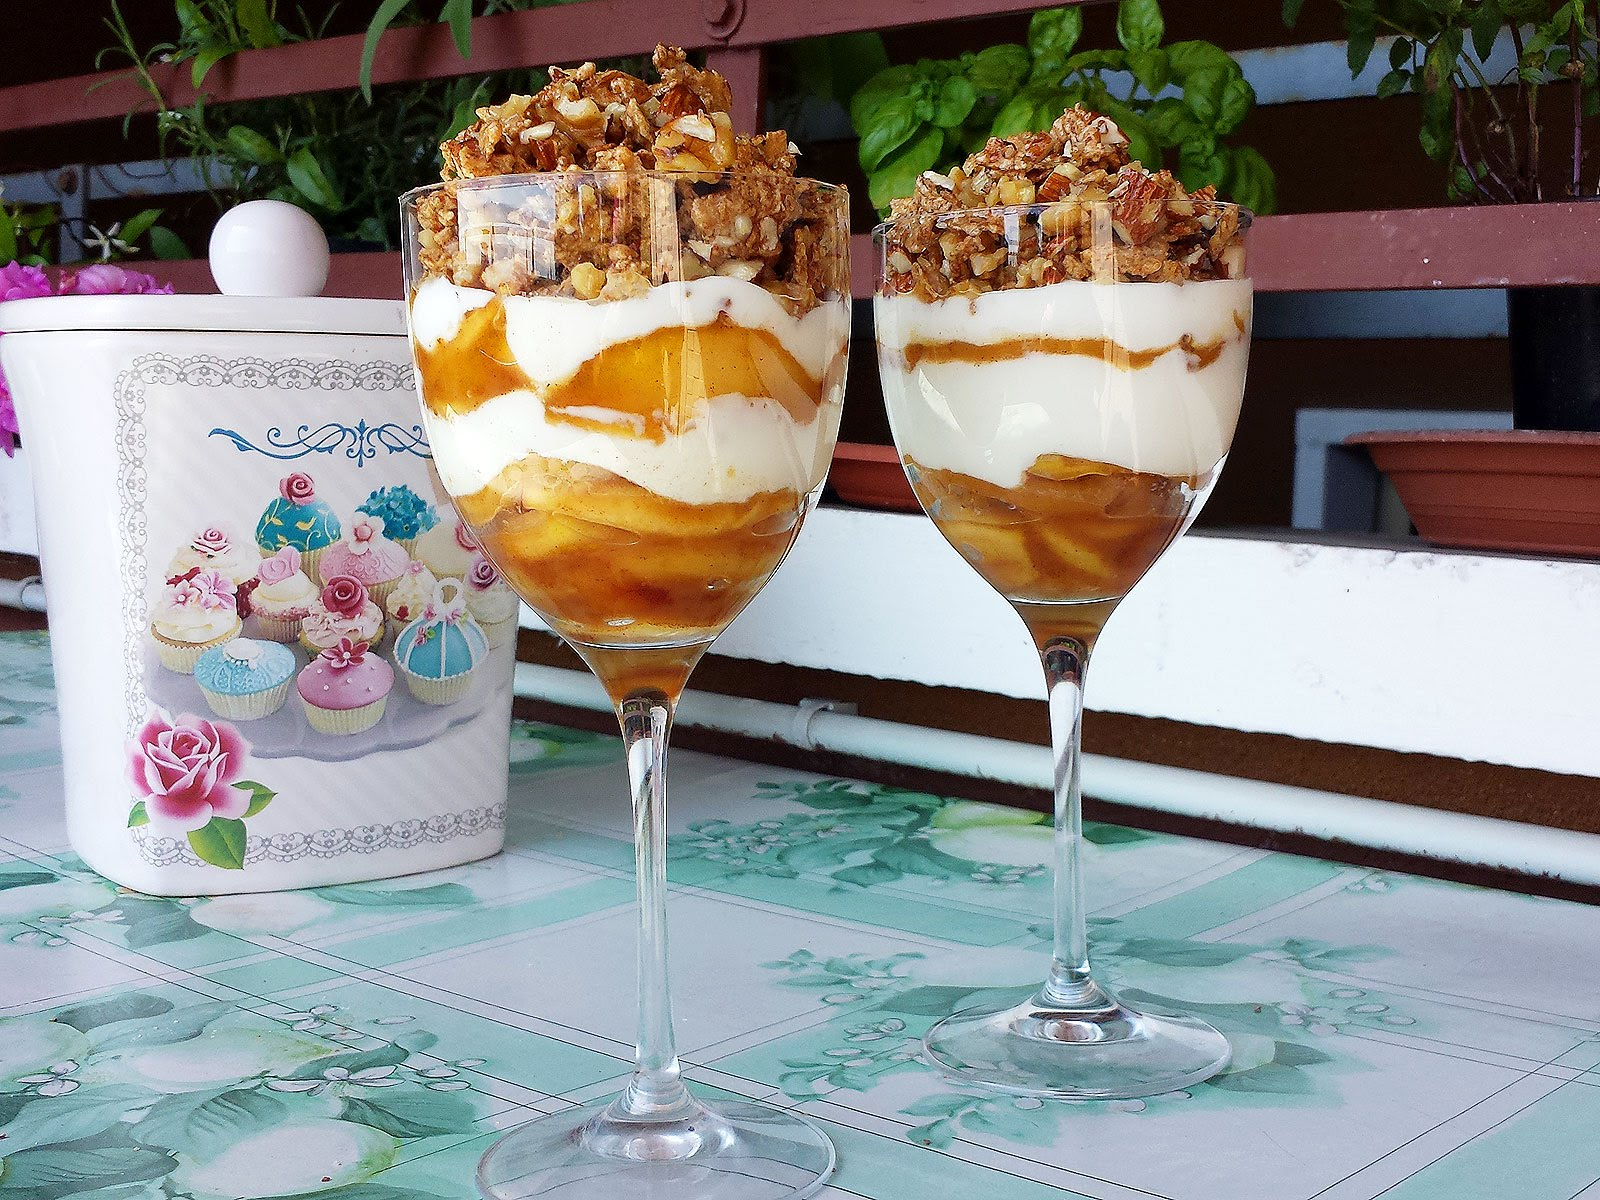 Dessert freschi: due ricette facili - CopyBlogger